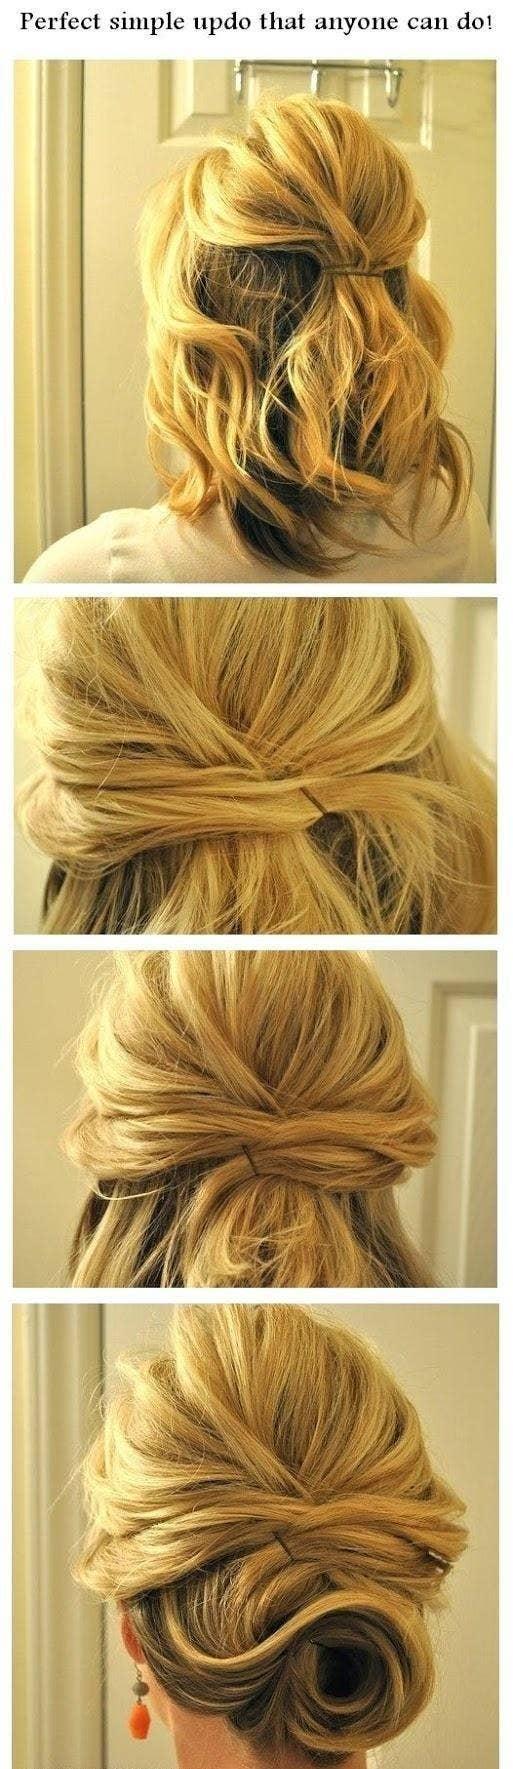 If You Have Short Hair, Crisscross Hair For A Messy Bun Effect